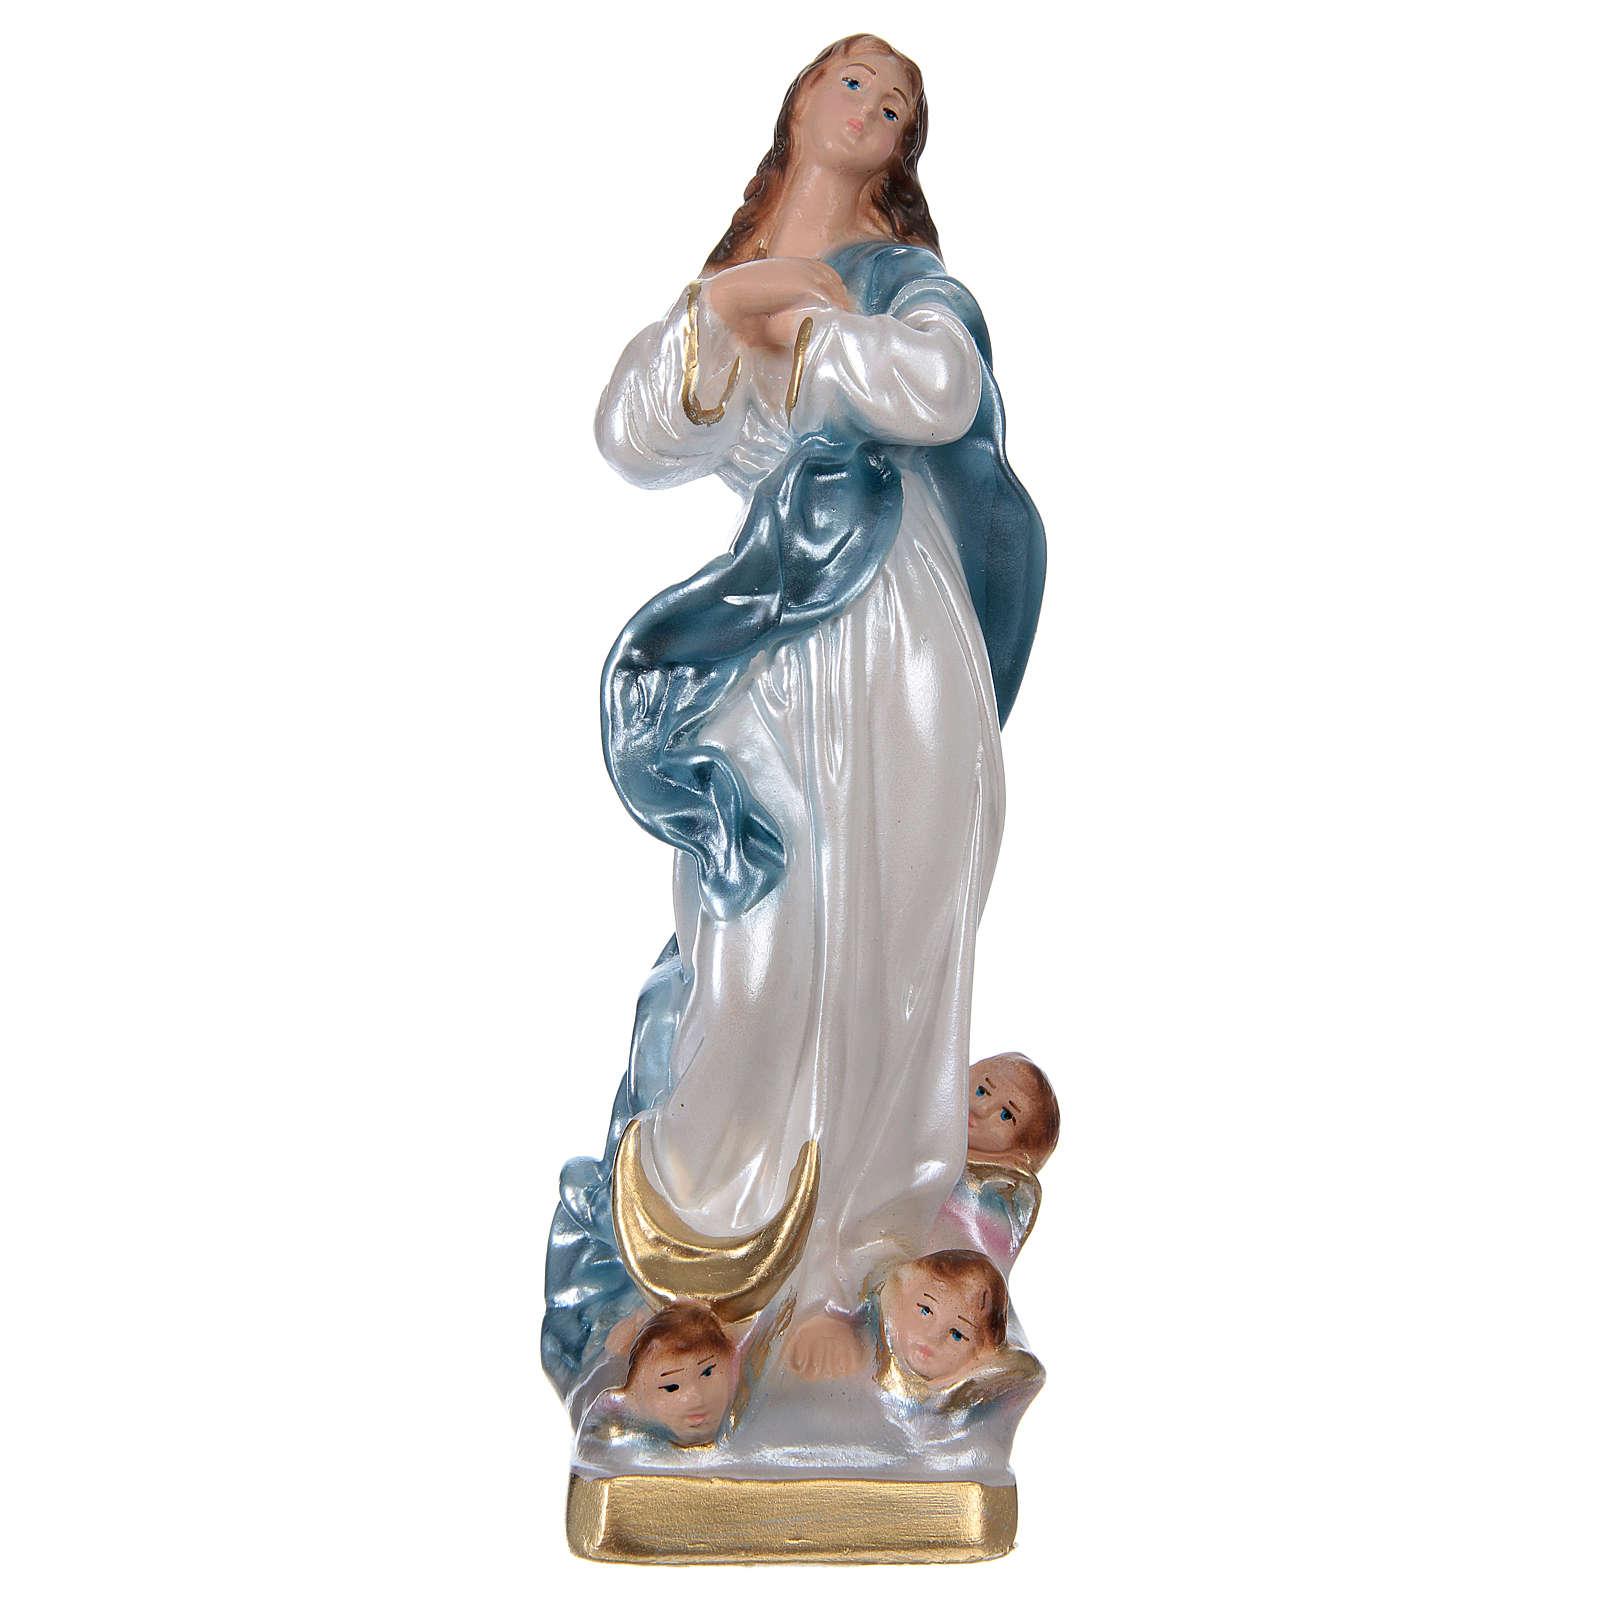 Estatua de yeso nacarado Virgen con ángeles 20 cm 4